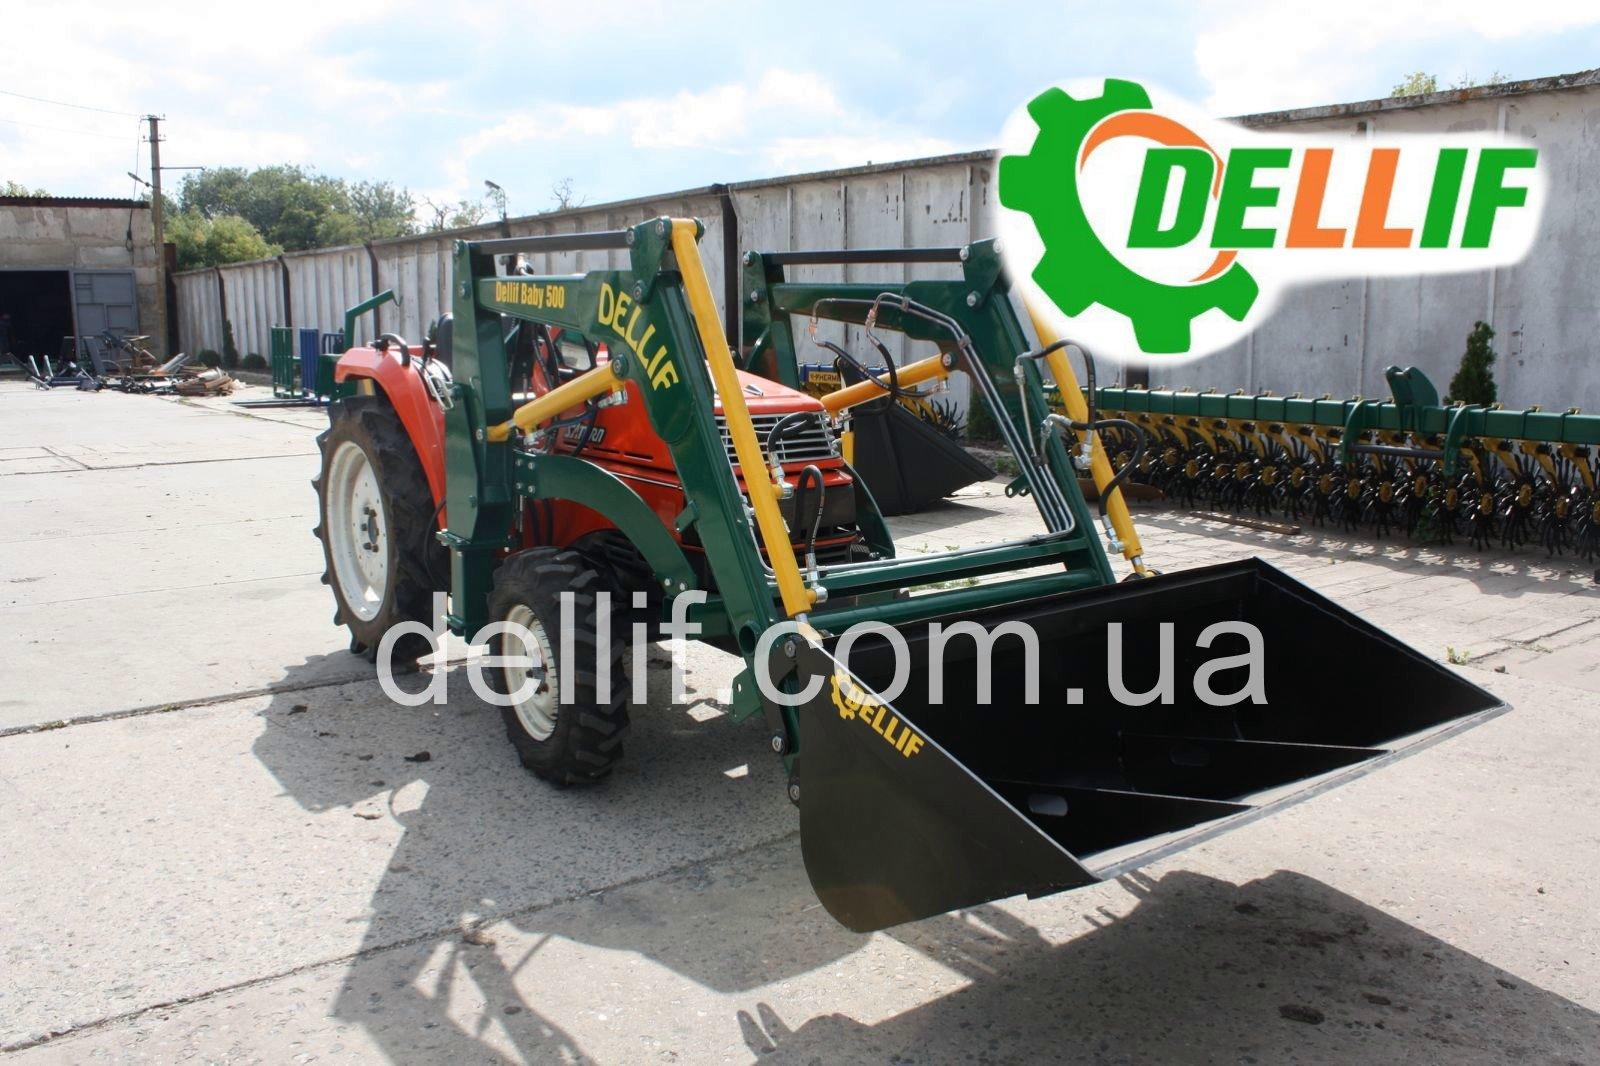 Погрузчик на мини-трактор (24- 40 л.с.) - кун Деллиф Бейби 500